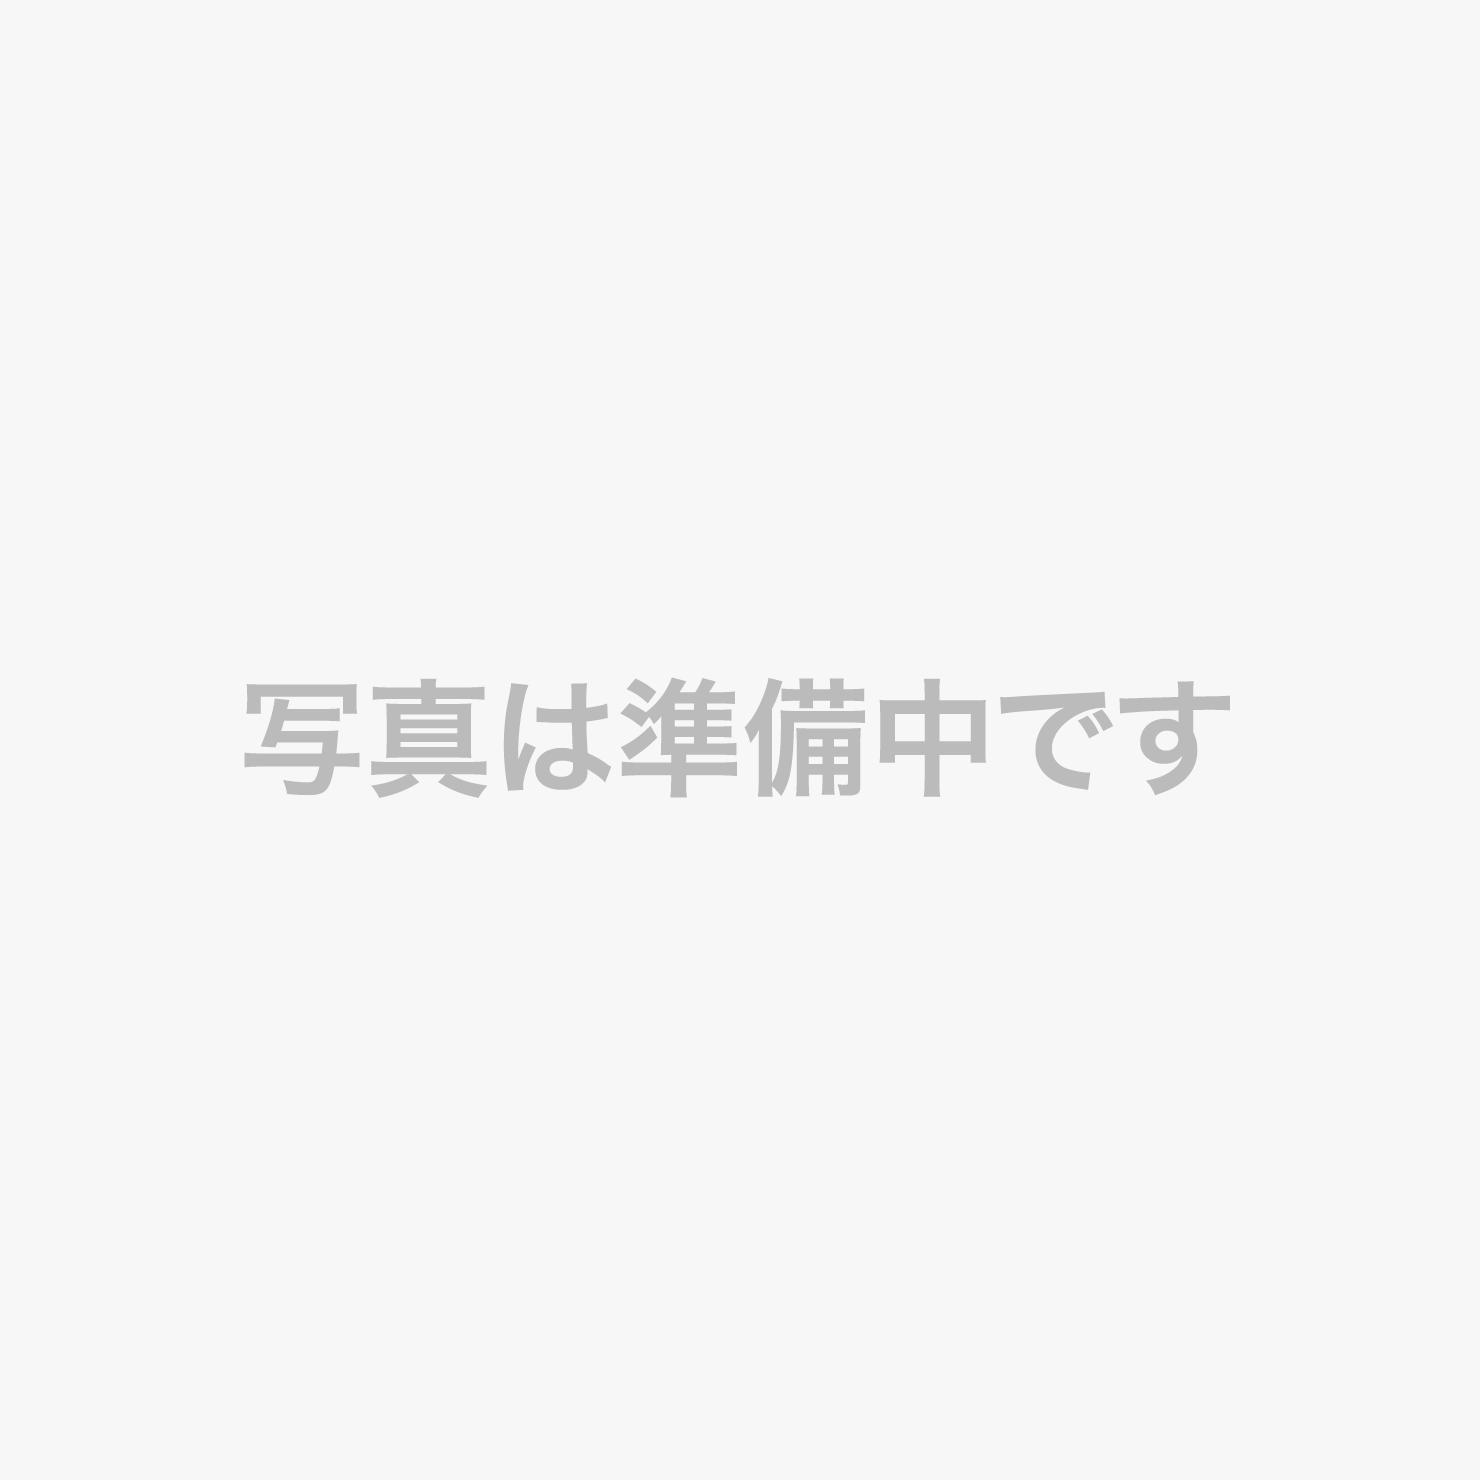 JR静岡駅南口より、徒歩1分